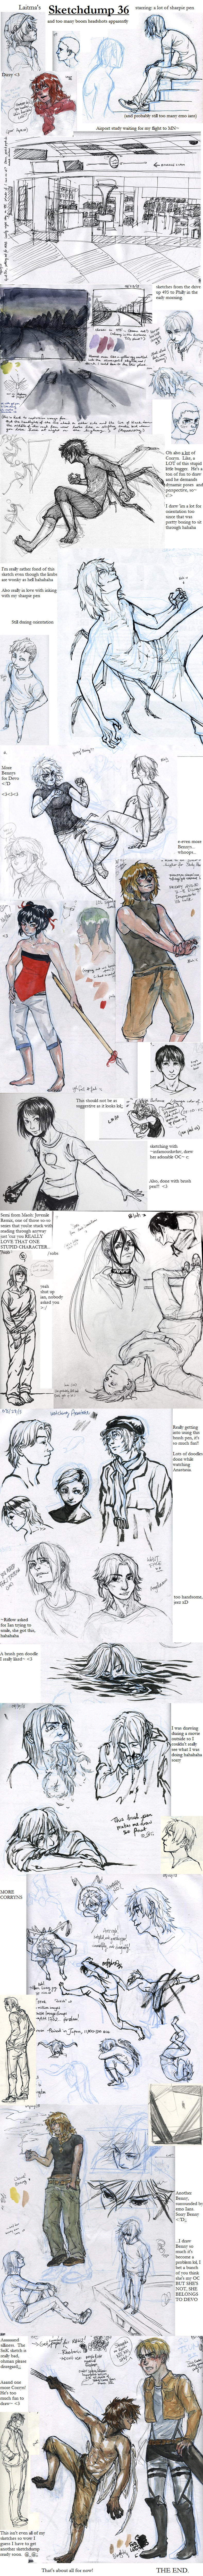 Sketchdump 36 by Laitma